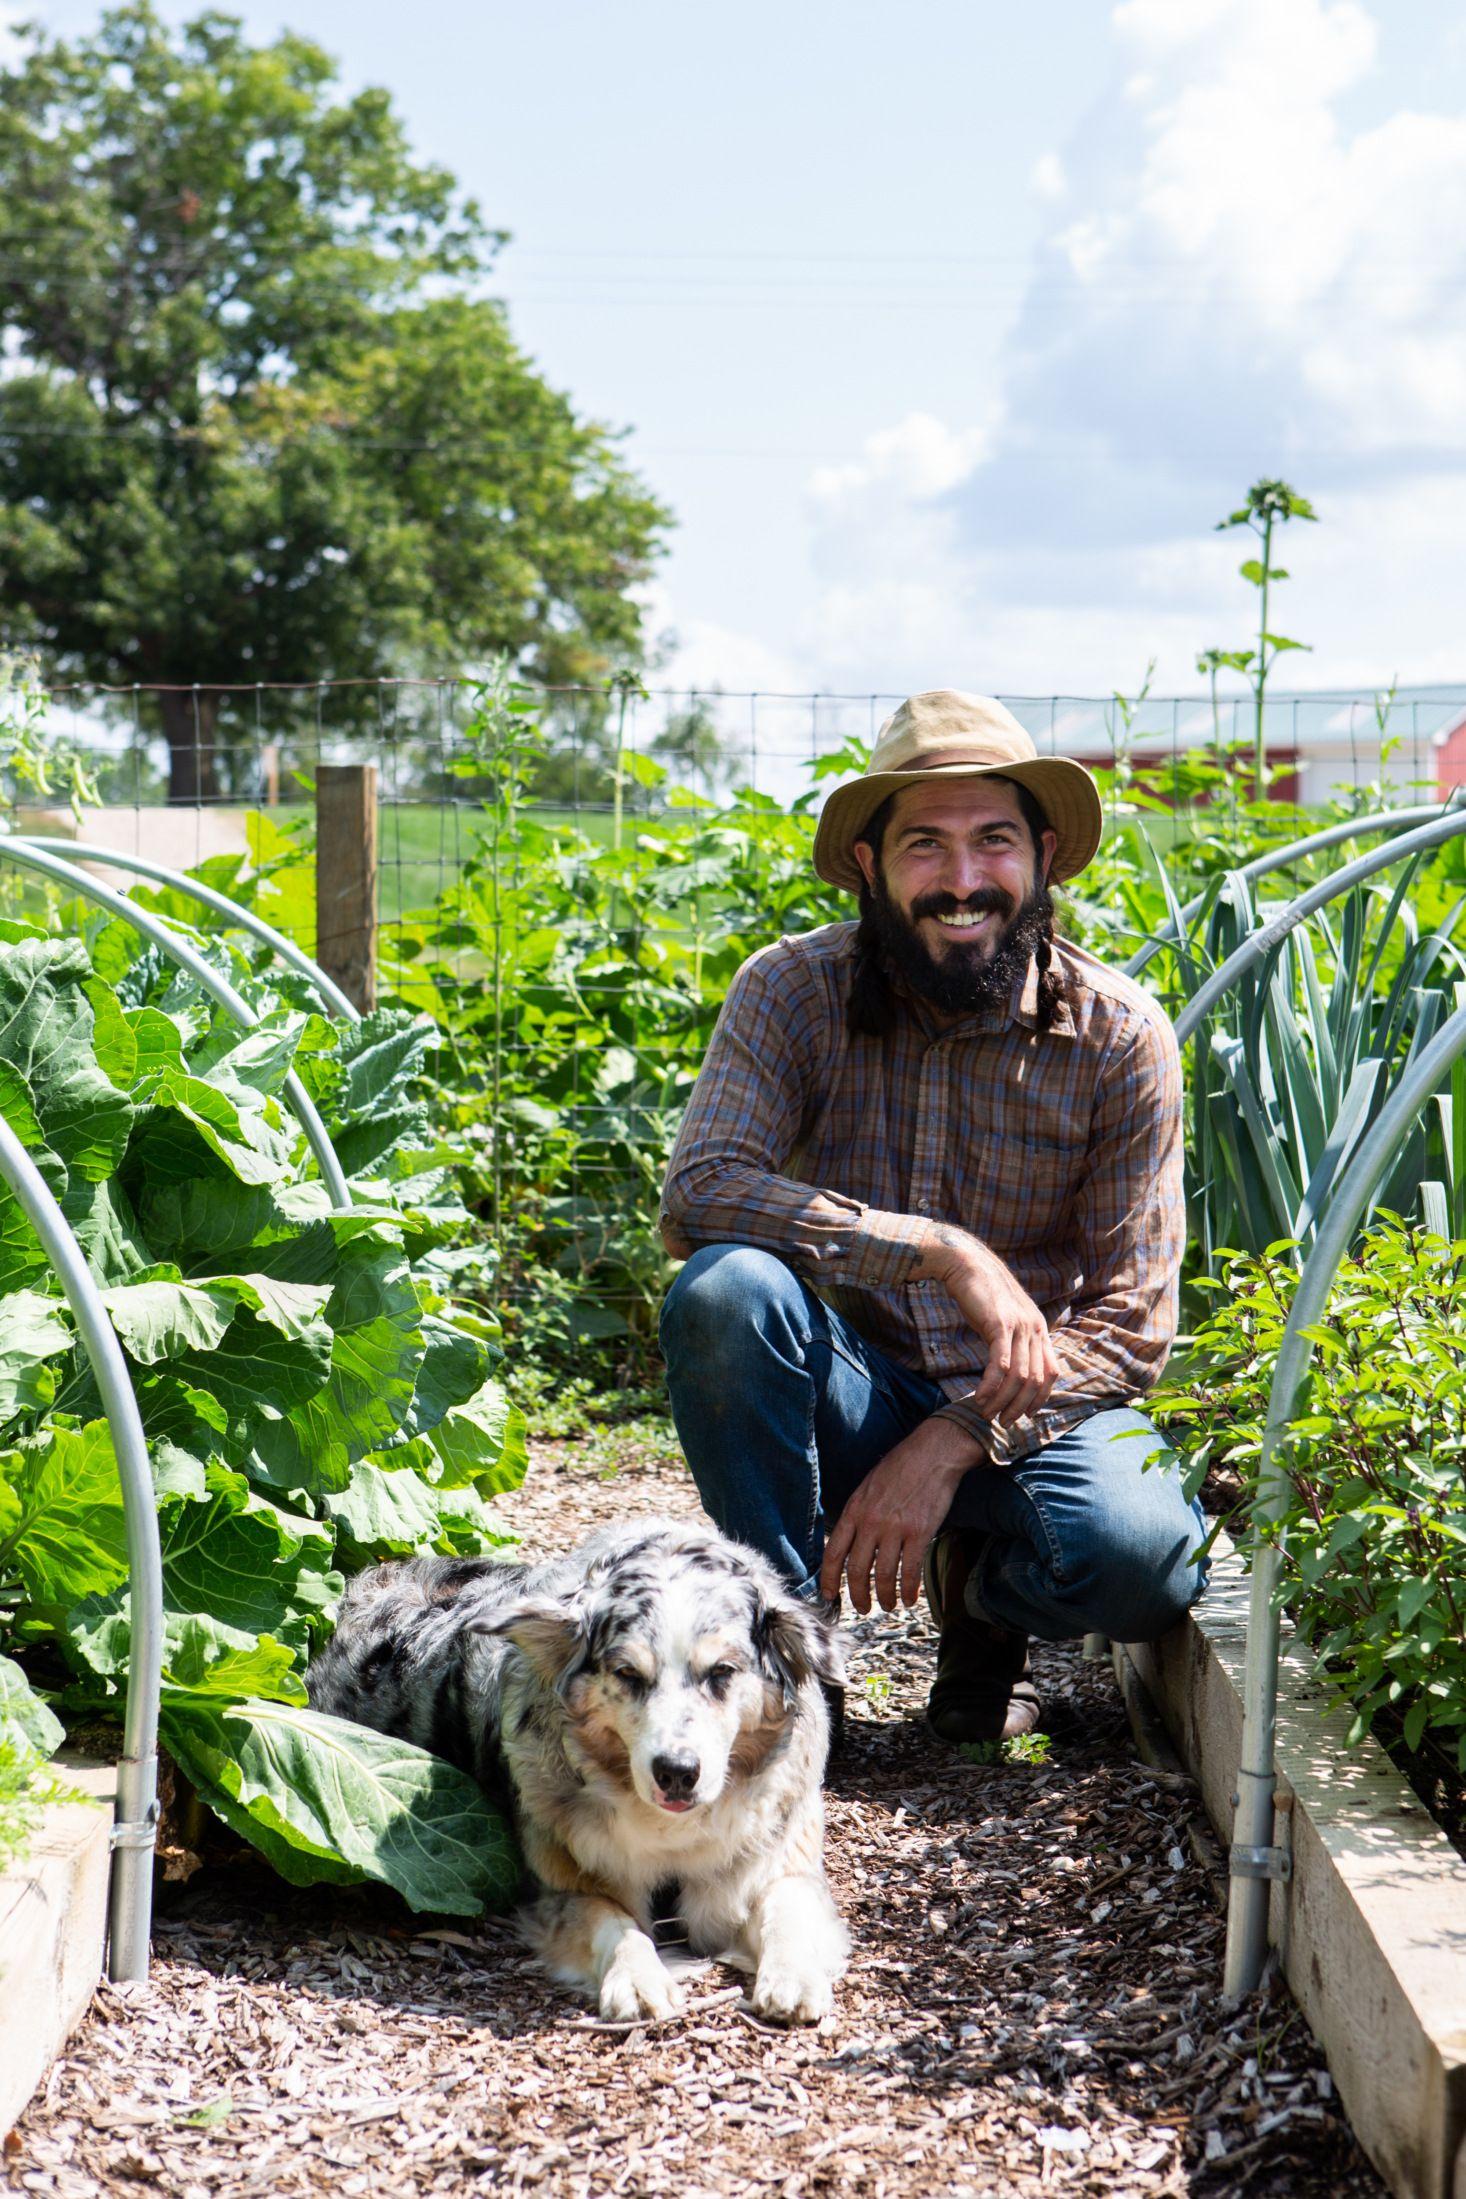 Farmer Stephen Lamberti and his dog at Zingerman's Cornman Farms in Dexter, Michigan.